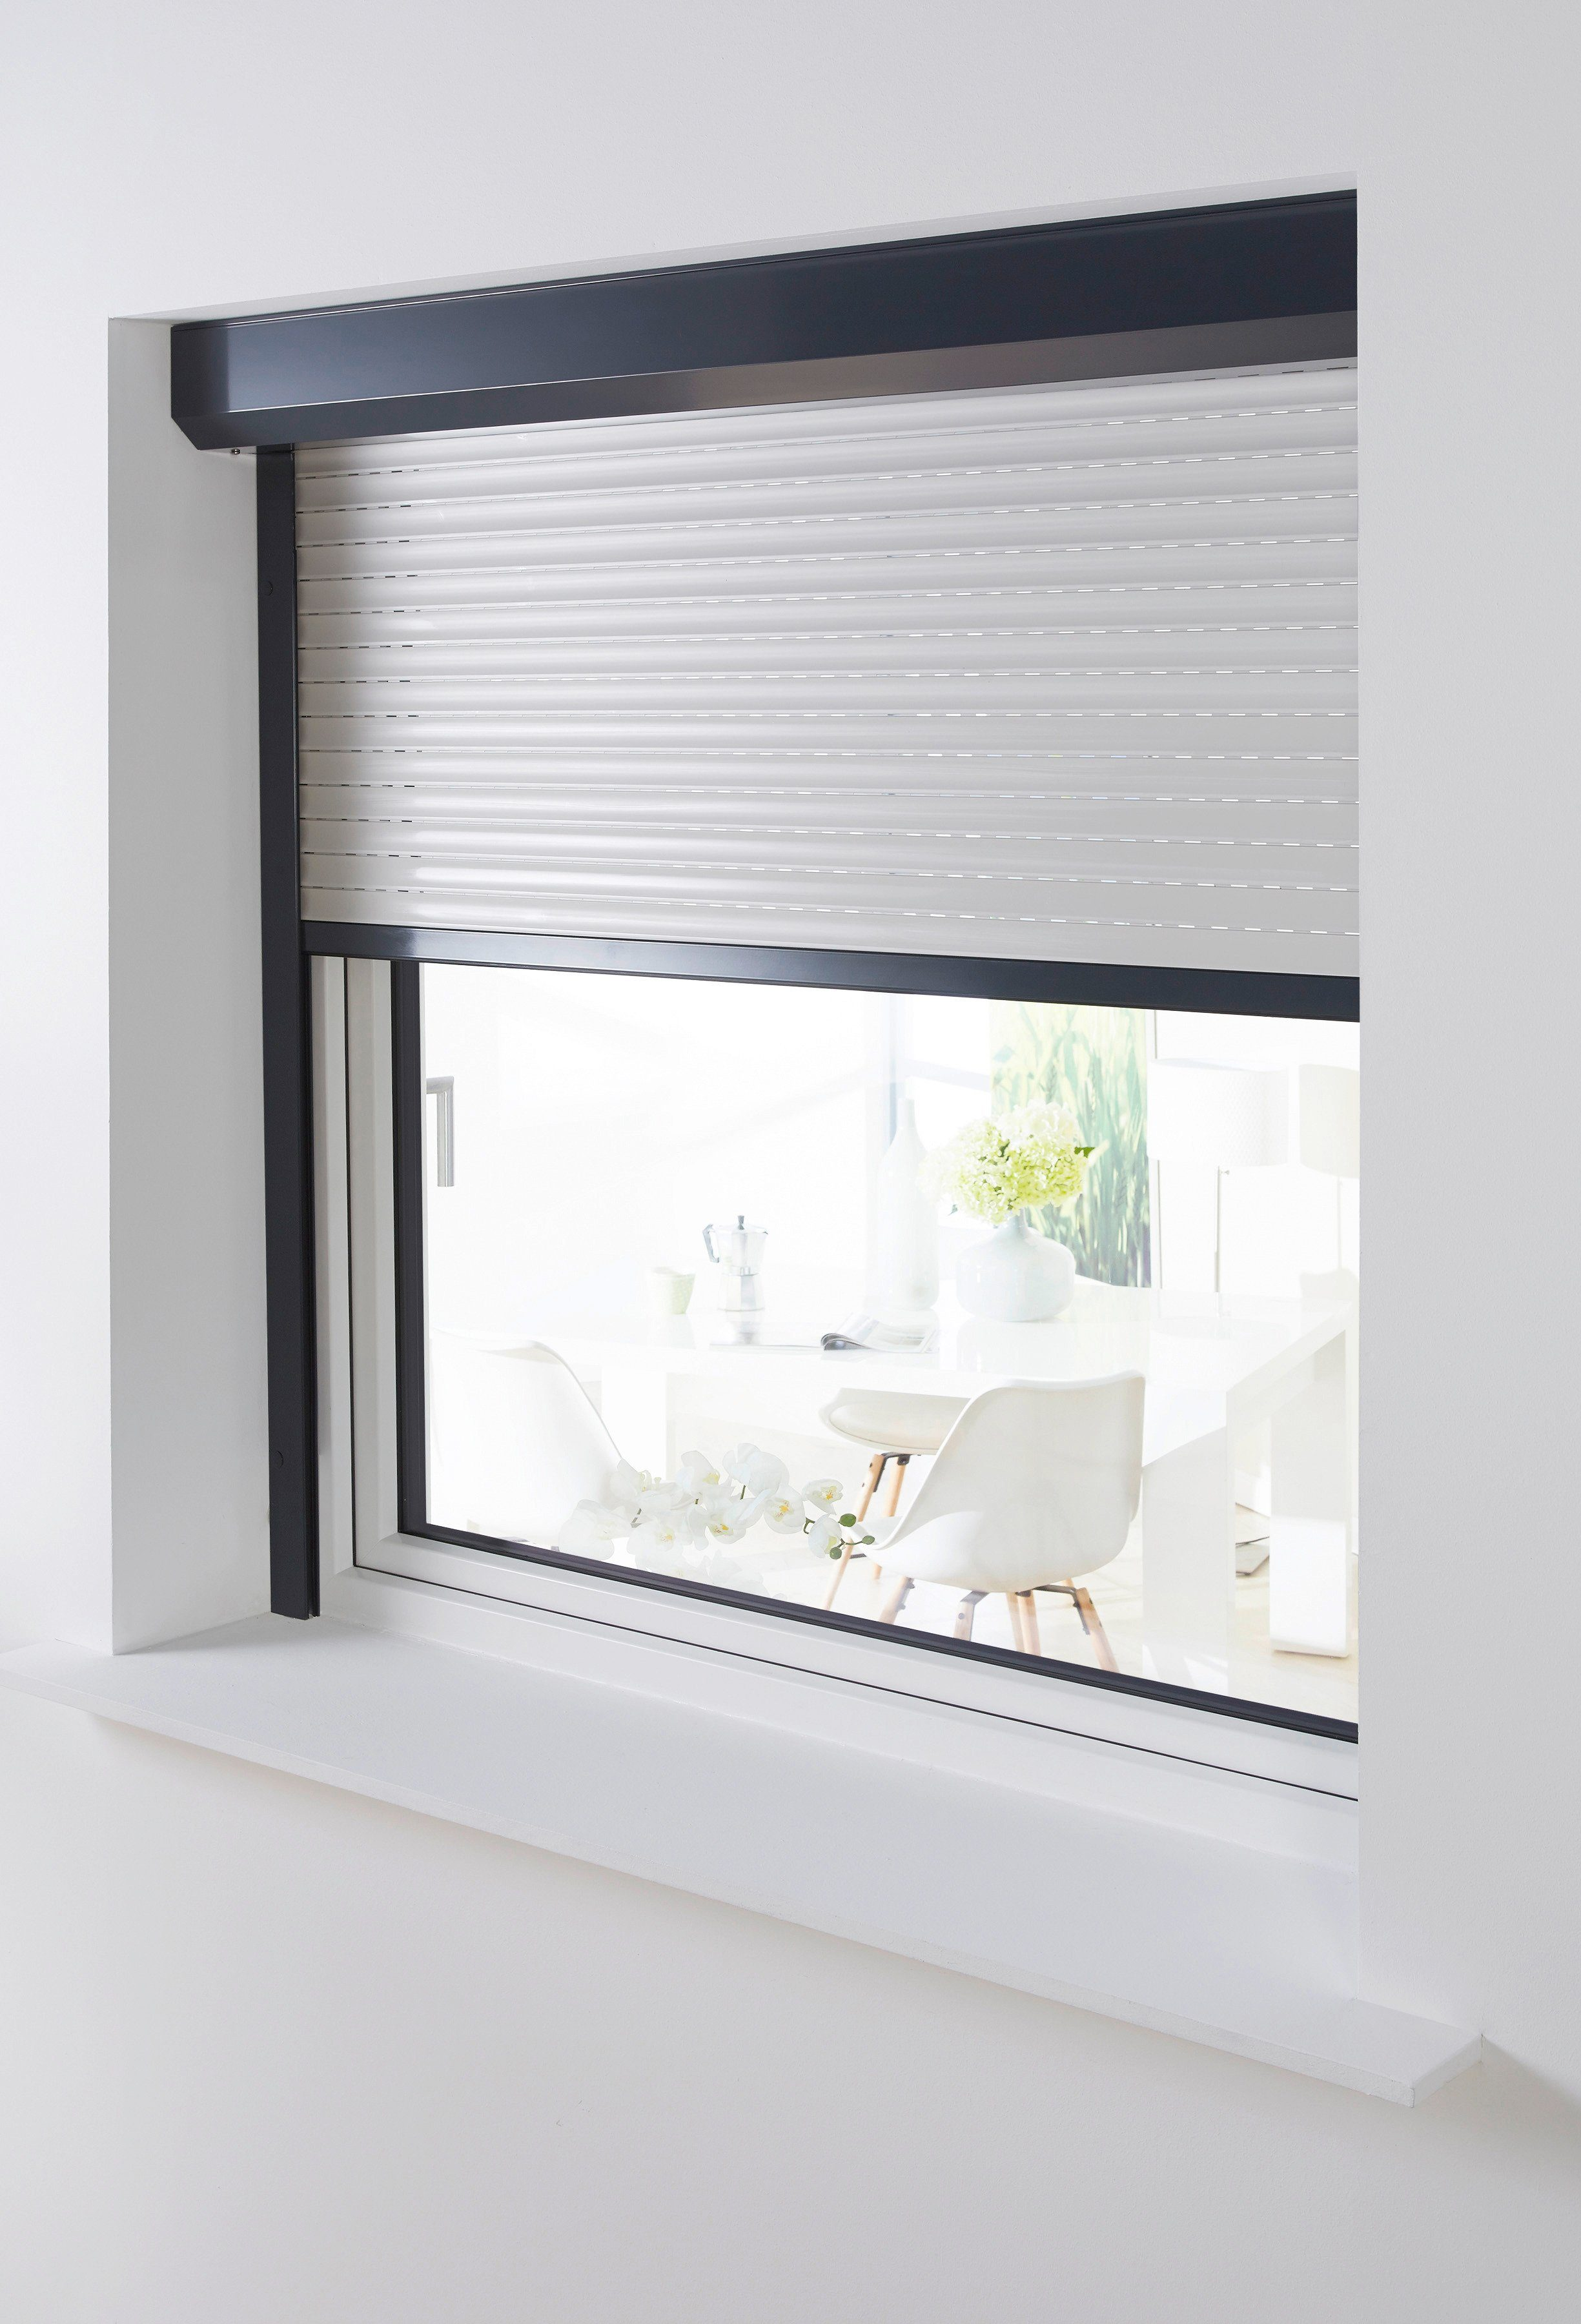 Aluminium »Vorbau-Rollladen« Sondermaß Breite, Höhe: 210 cm, anthrazit-grau